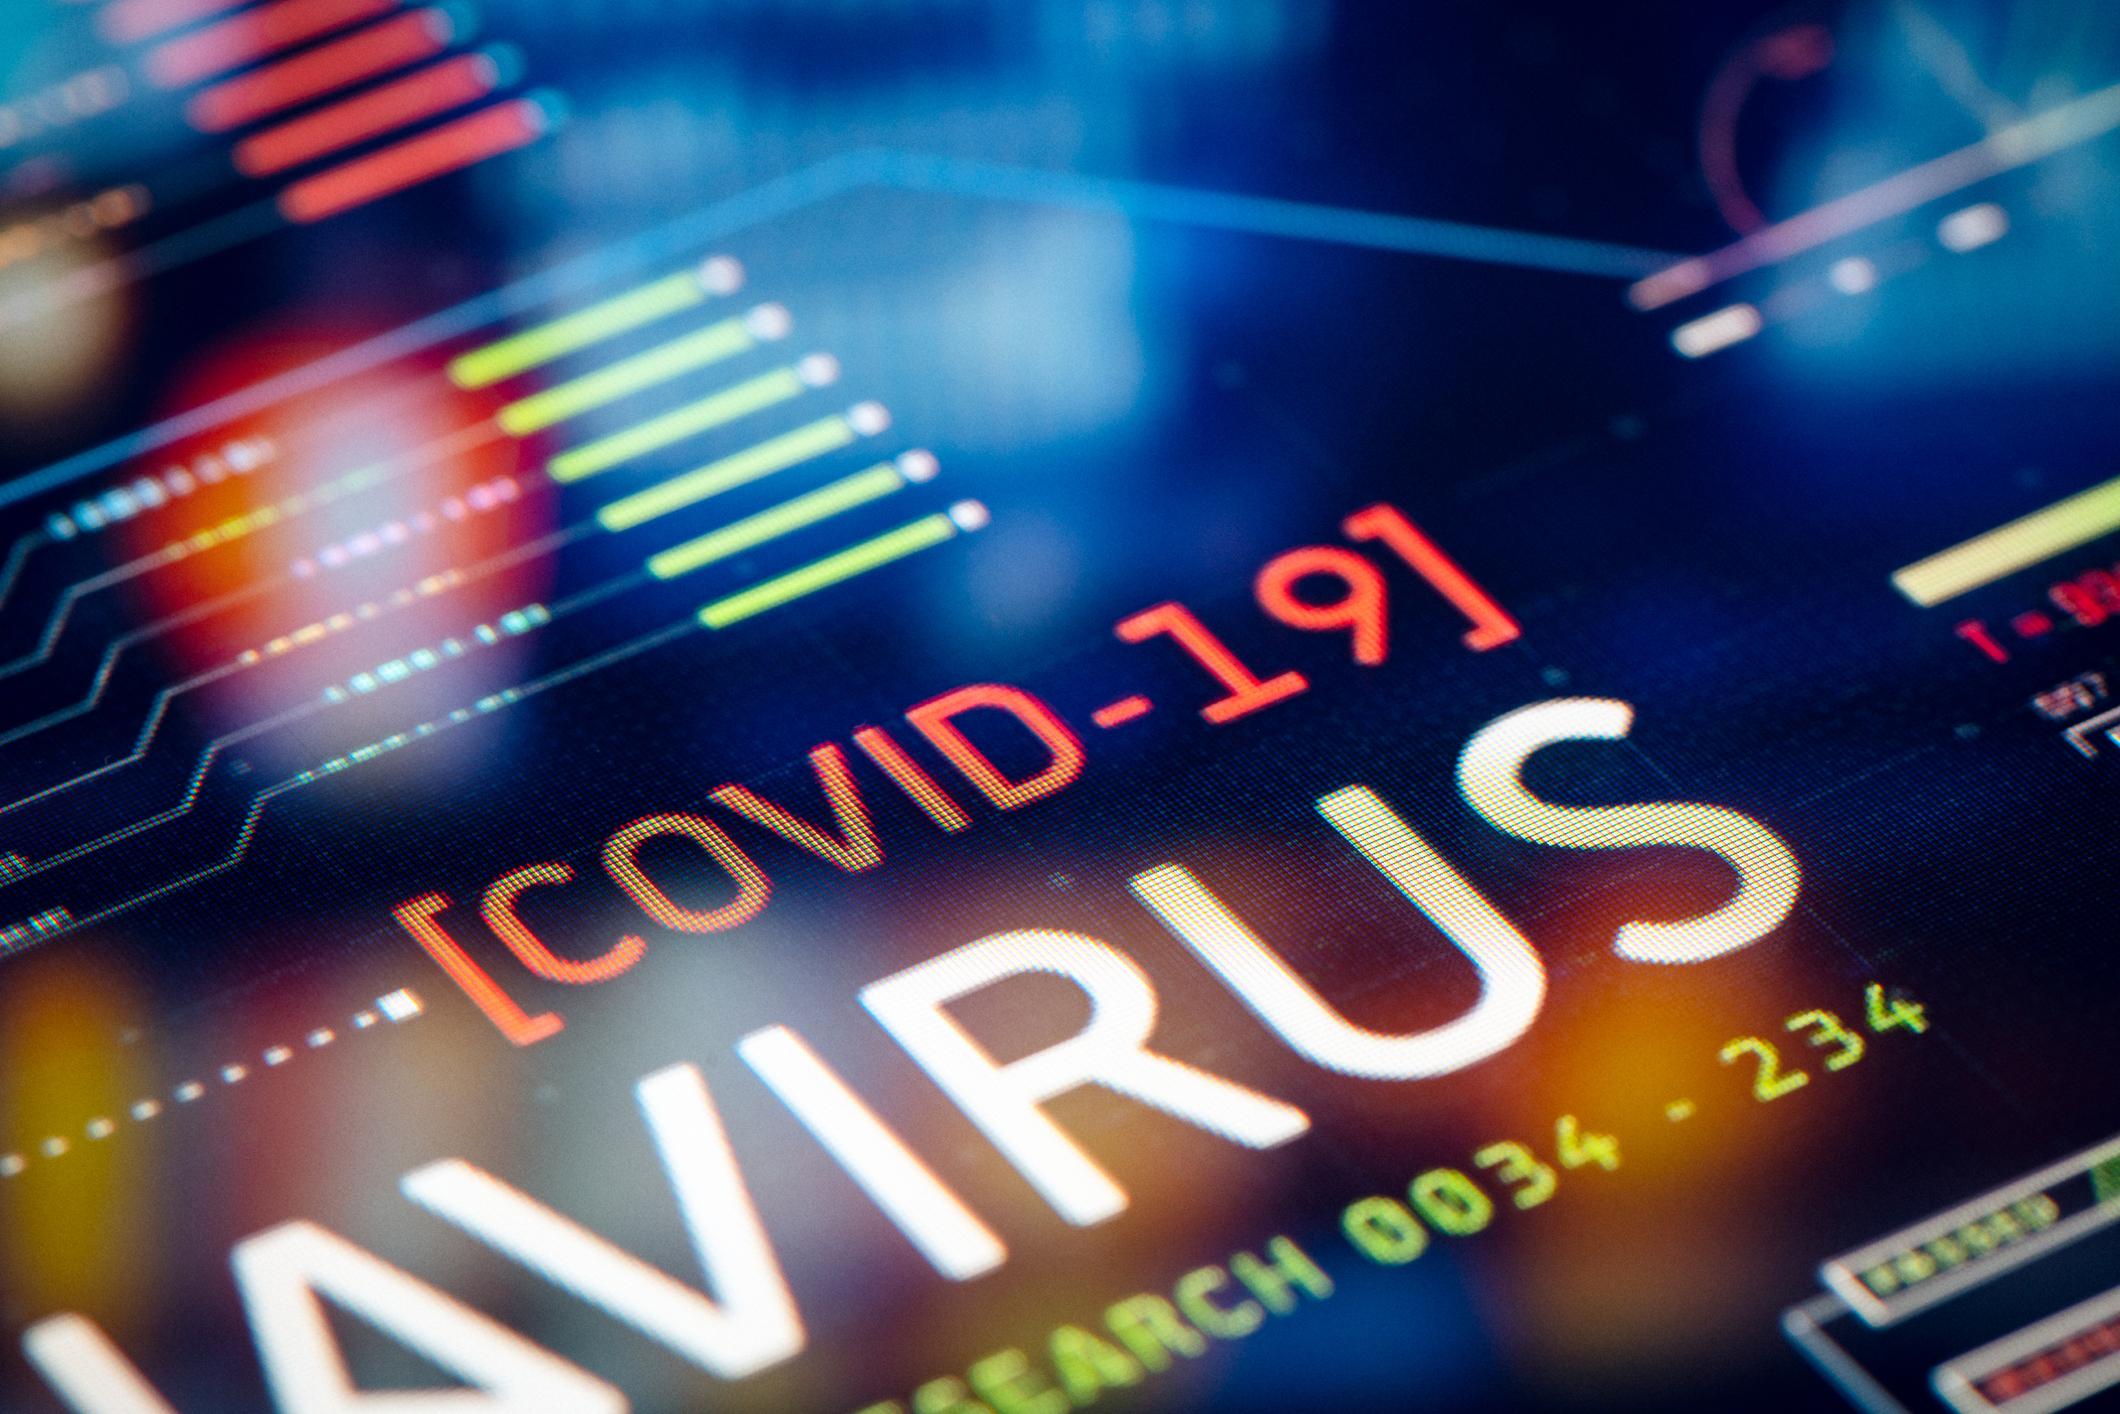 Plymouth girl, 10, diagnosed with coronavirus despite no 'usual symptoms'